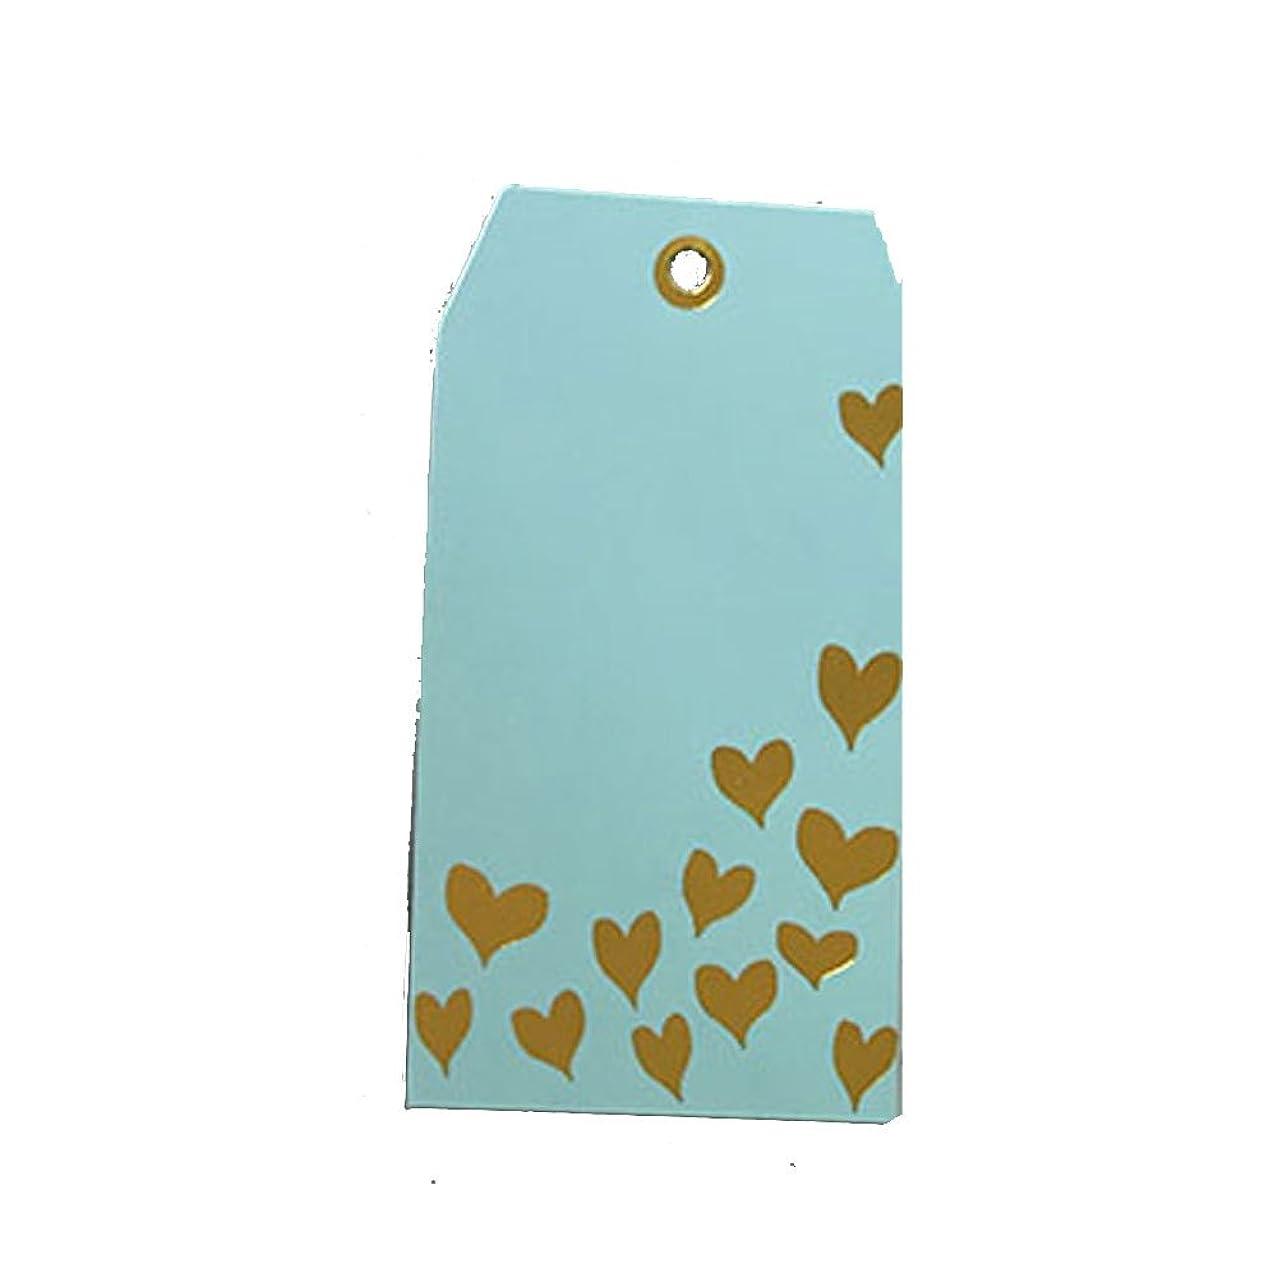 Presto Card Stock Gift Tag Gold Hearts Tags (5 Pack)